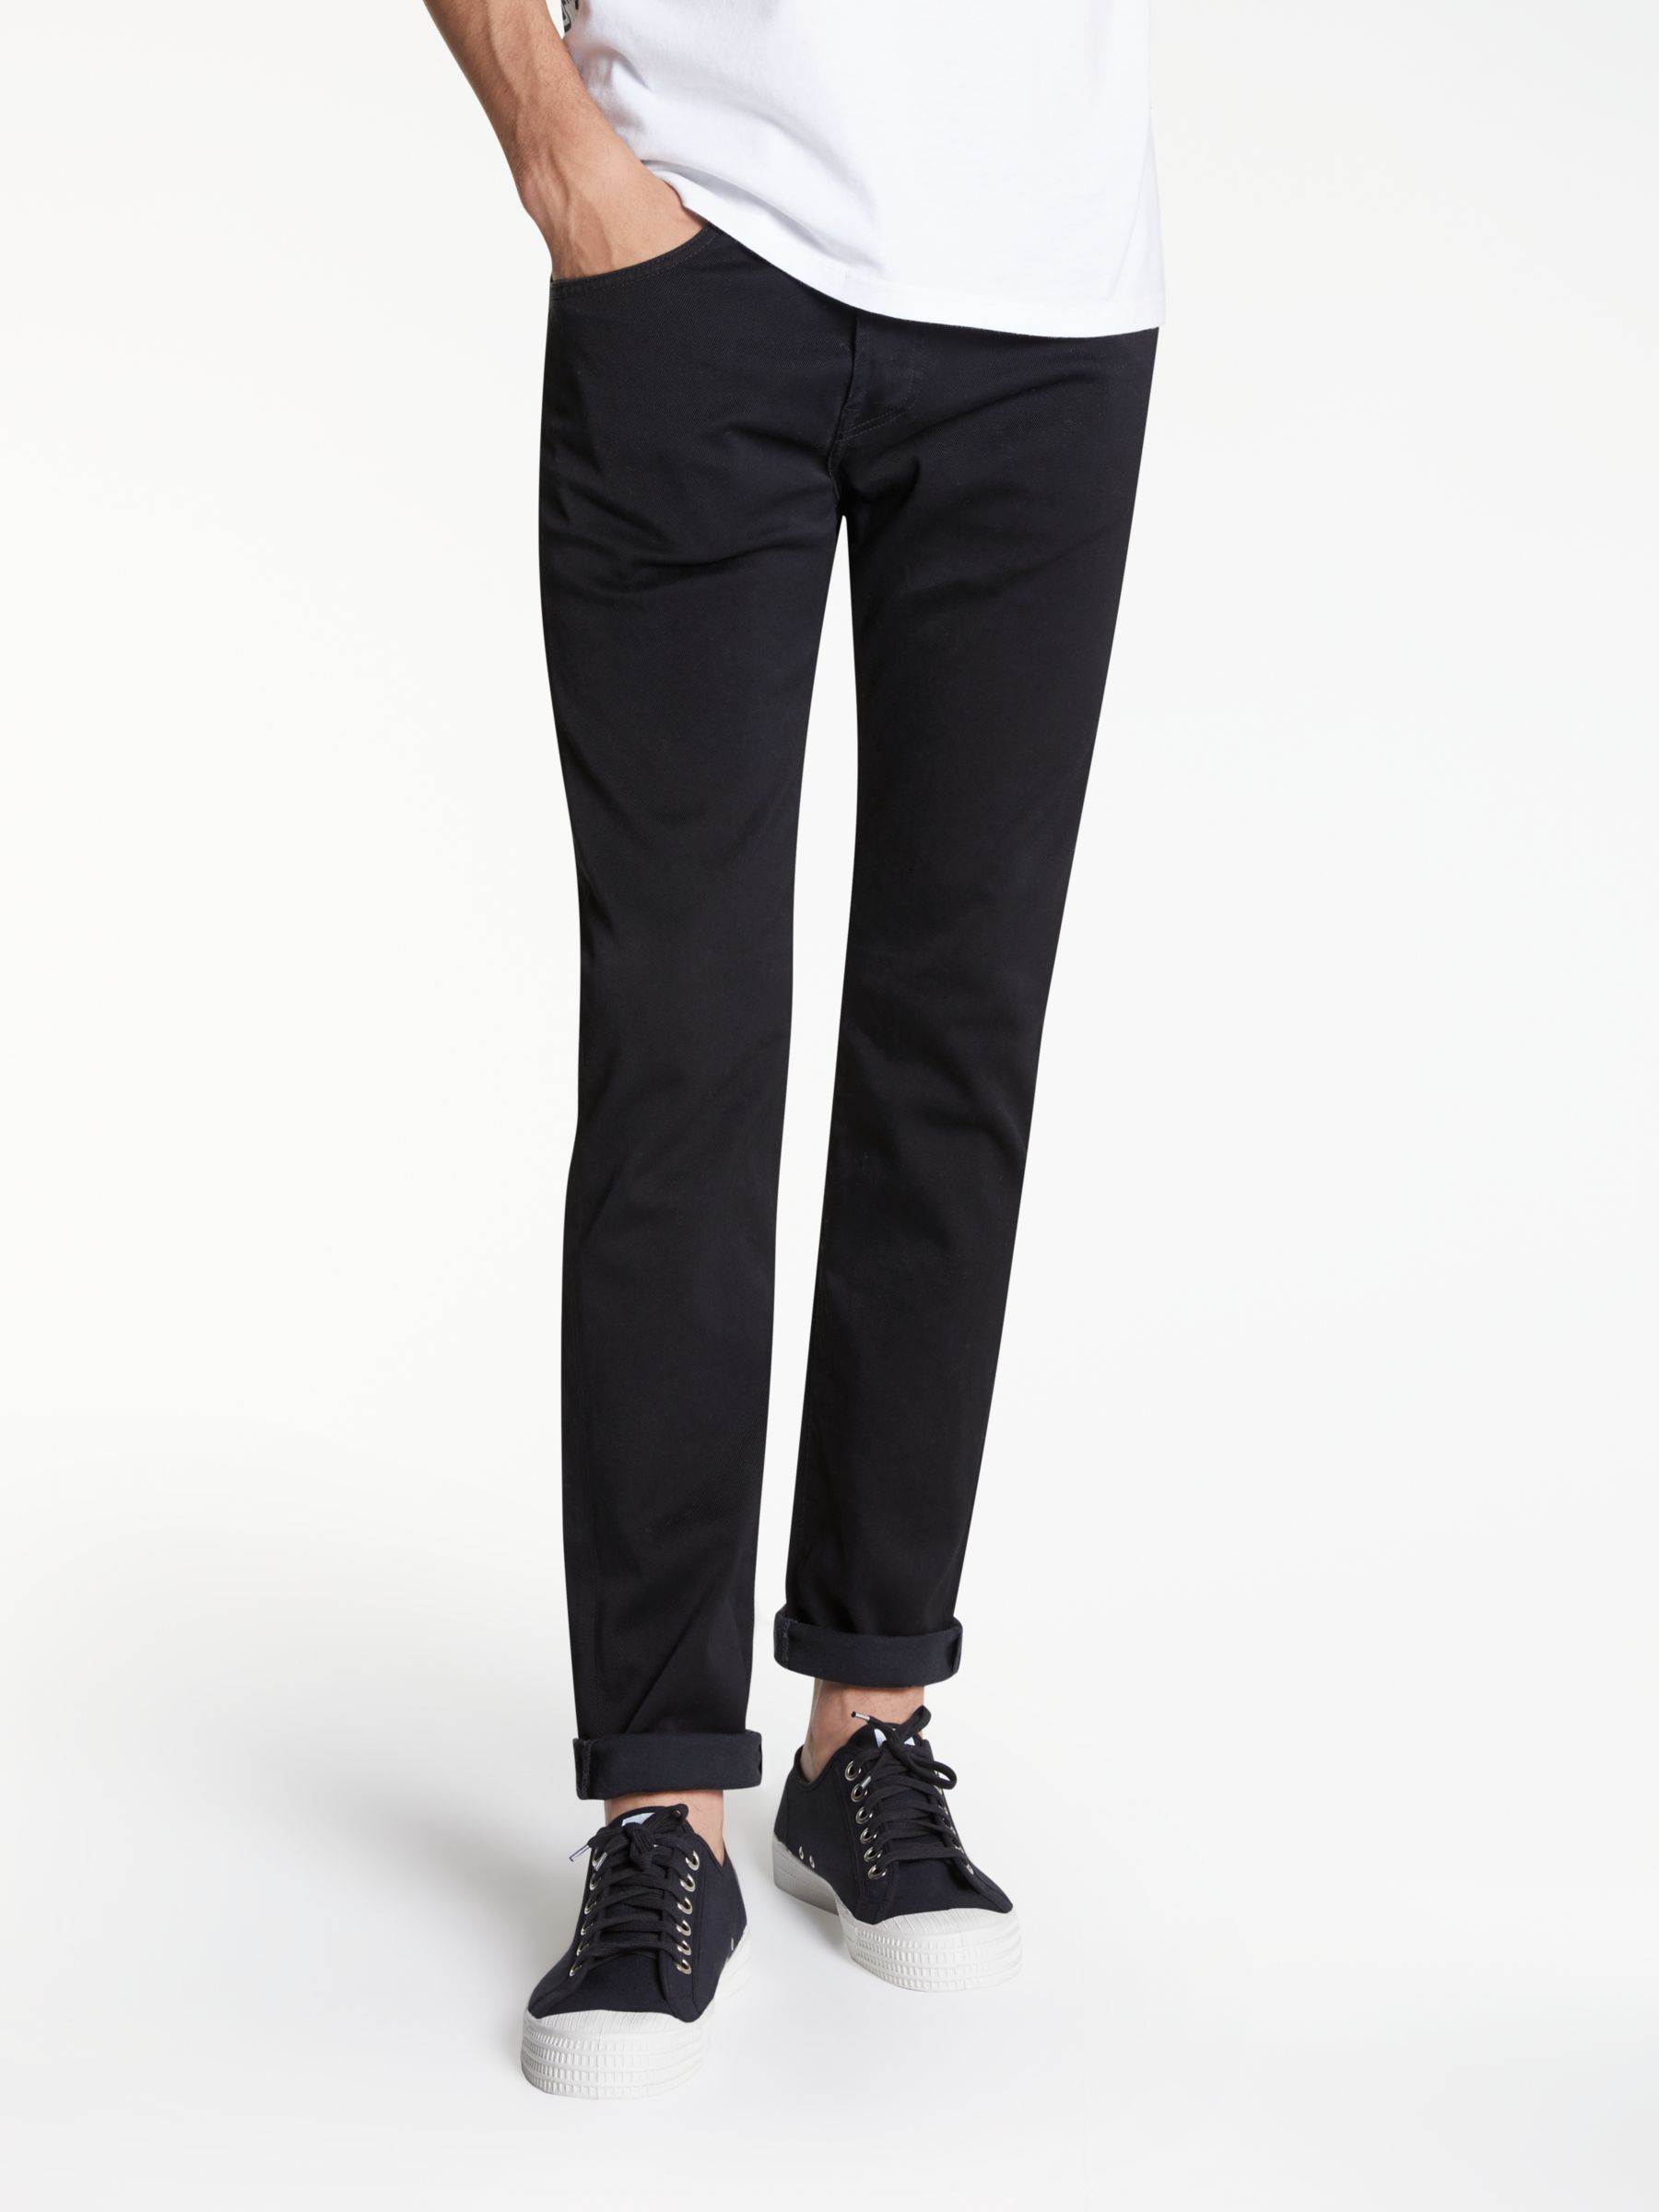 Edwin Edwin ED-80 Slim Tapered Jeans, Ink Black Denim